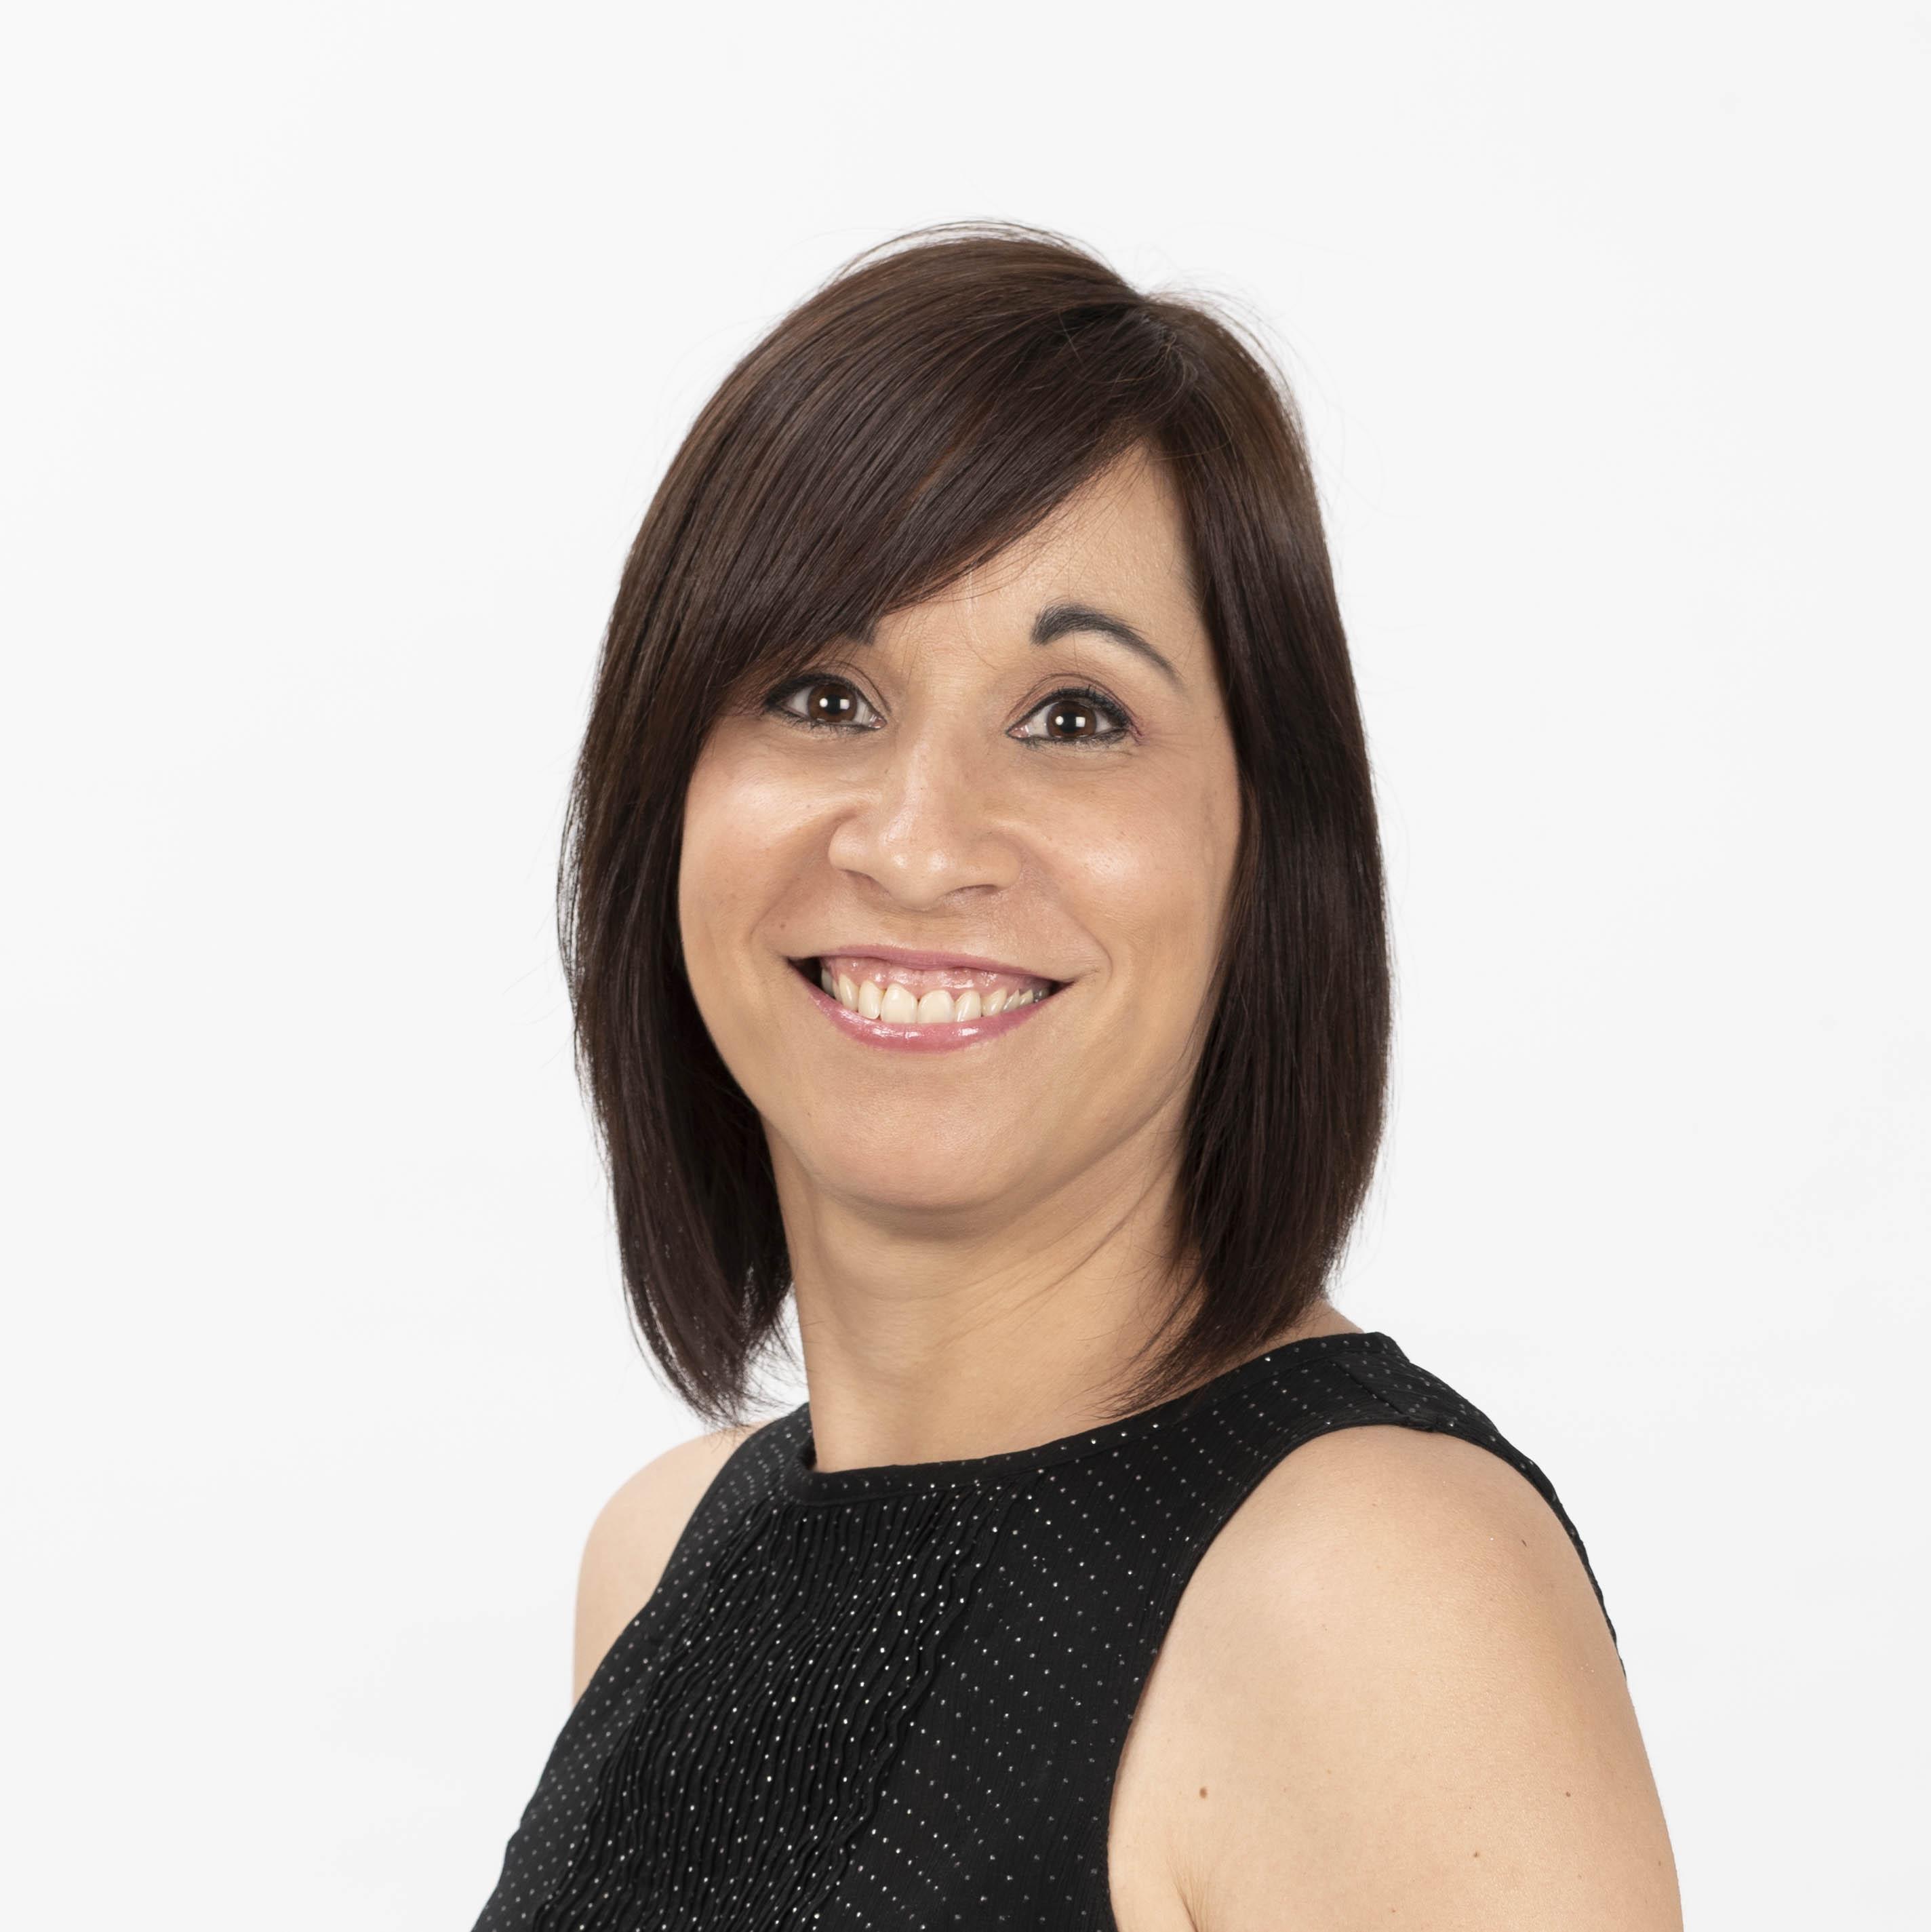 Cristina Torregrosa